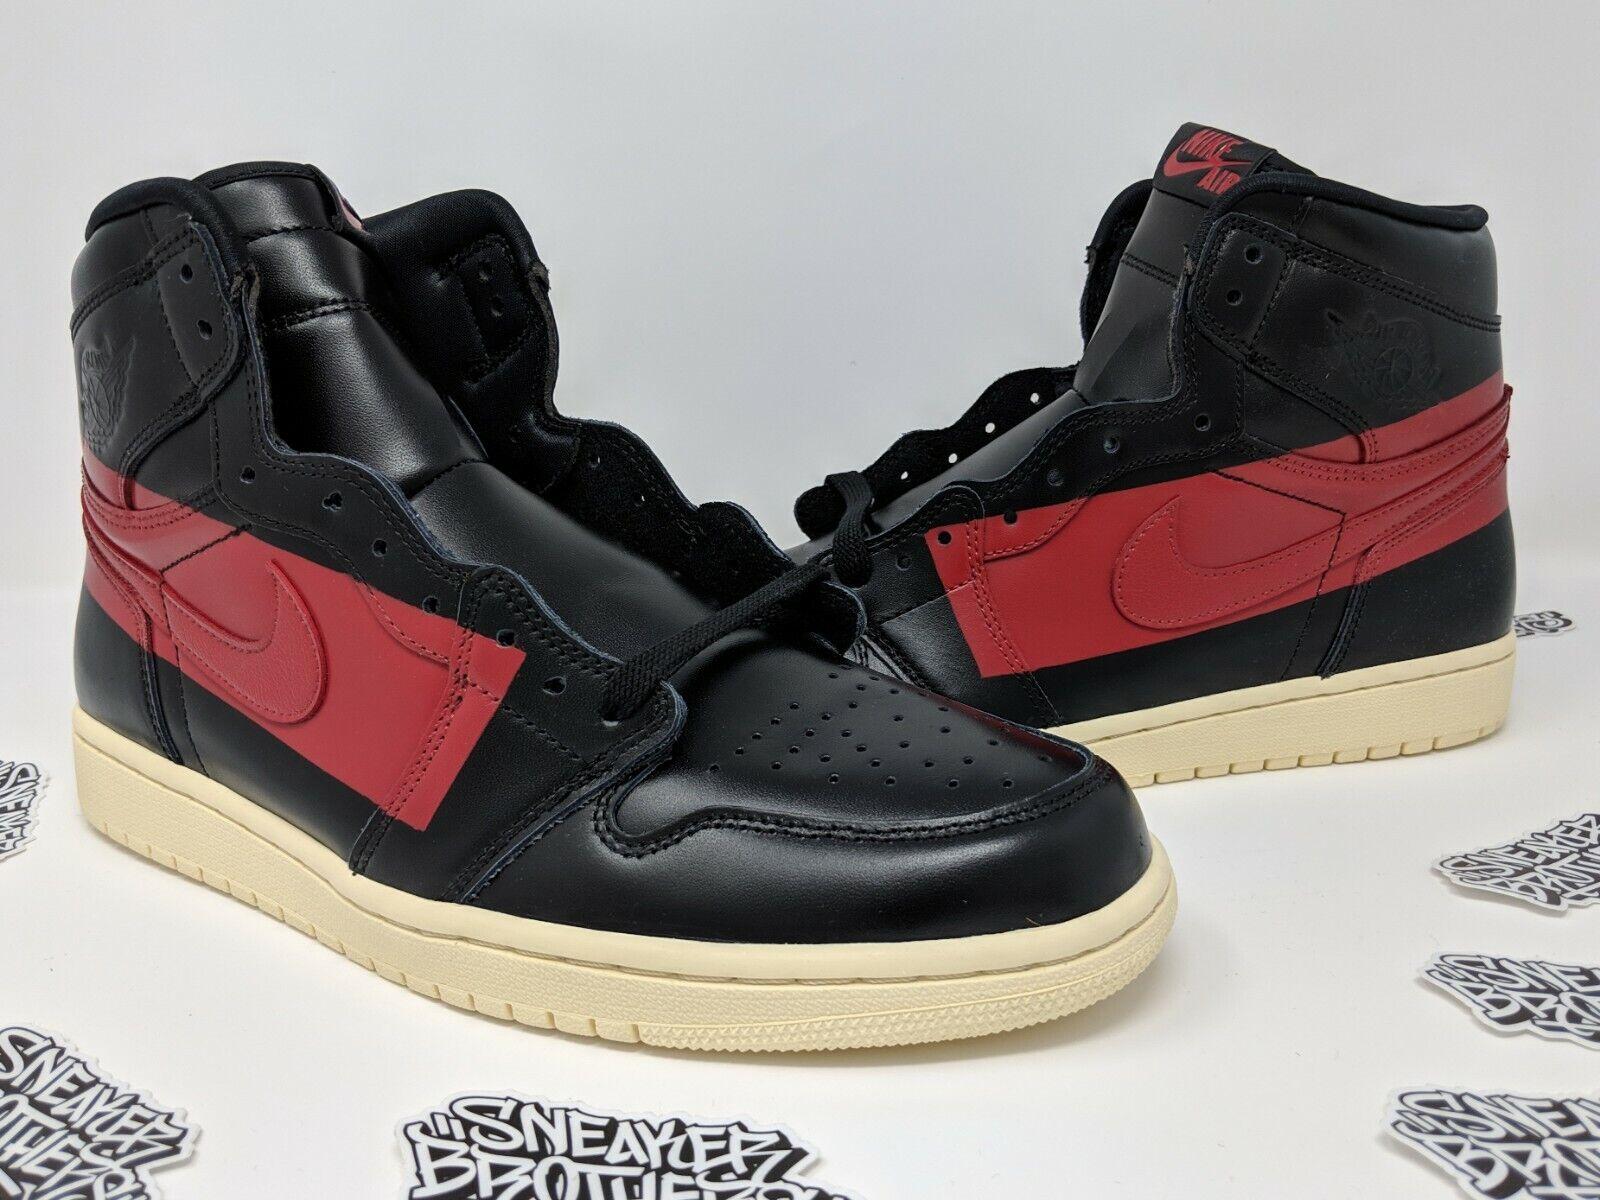 Nike Air Jordan Retro I 1 High OG Defiant Couture Black Gym Red BQ6682-006